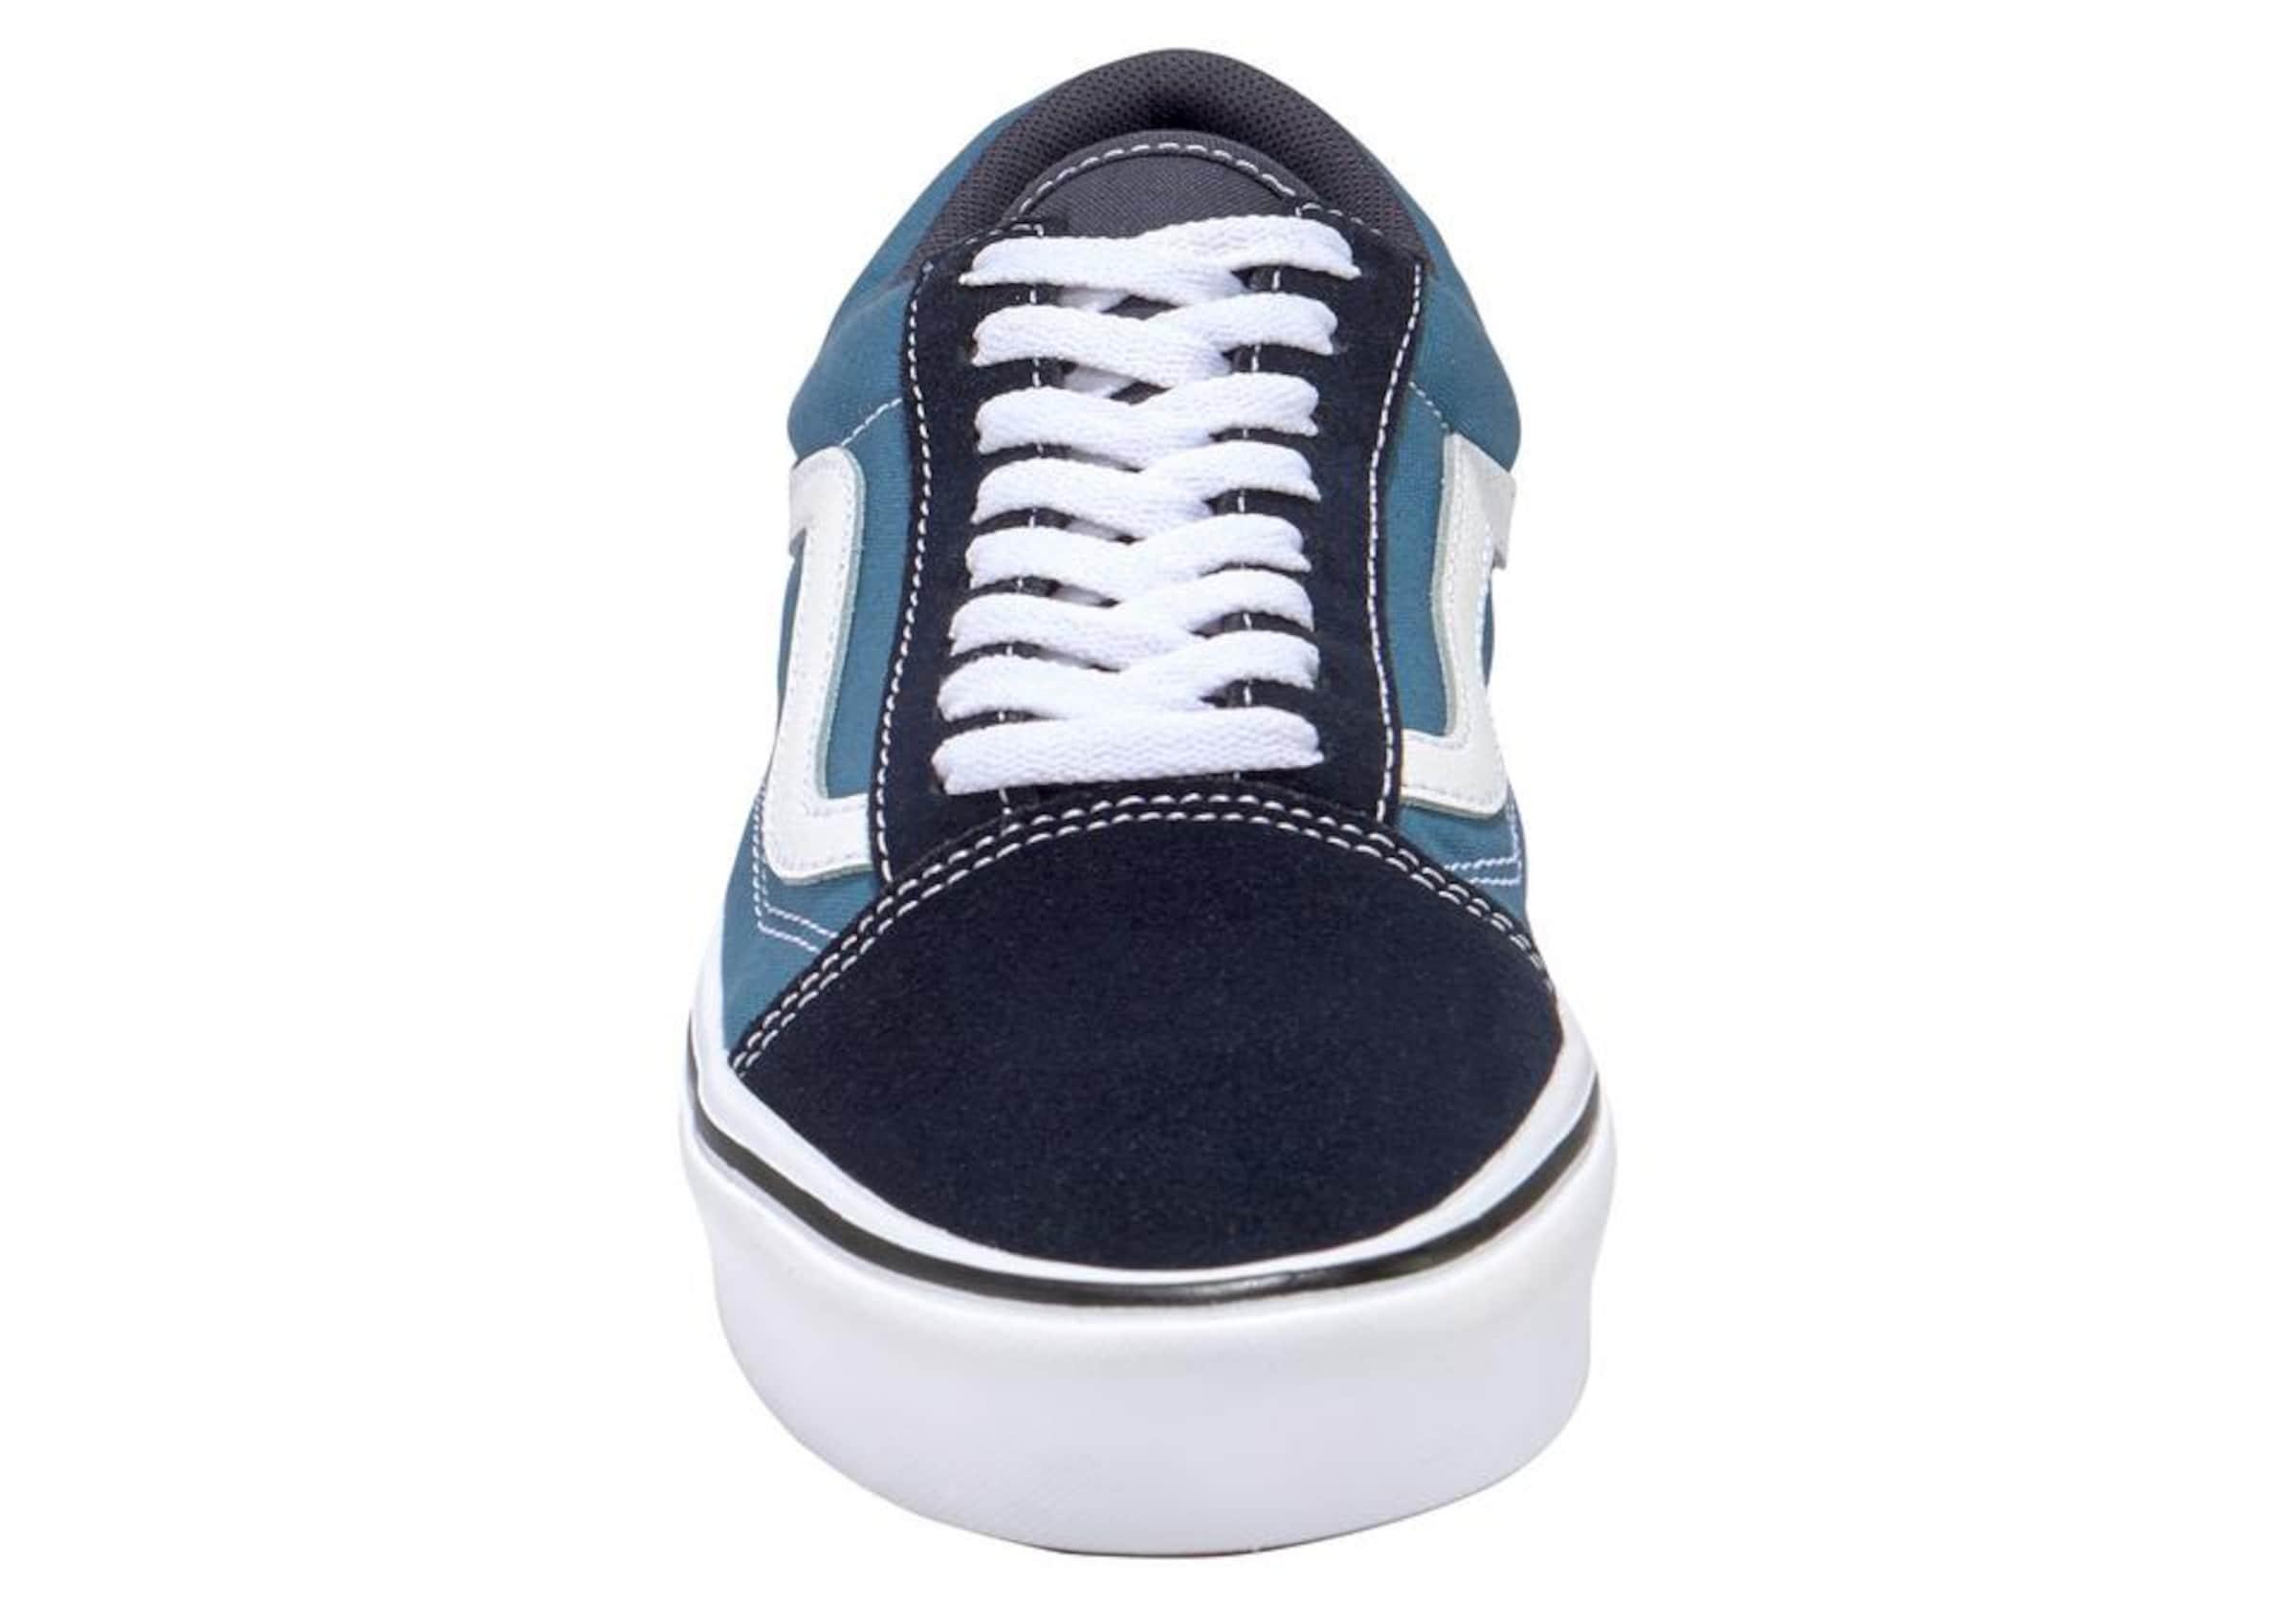 Old Cush Vans Weiß Skool' In Sneaker NachtblauHimmelblau 'comfy OTXuZPki